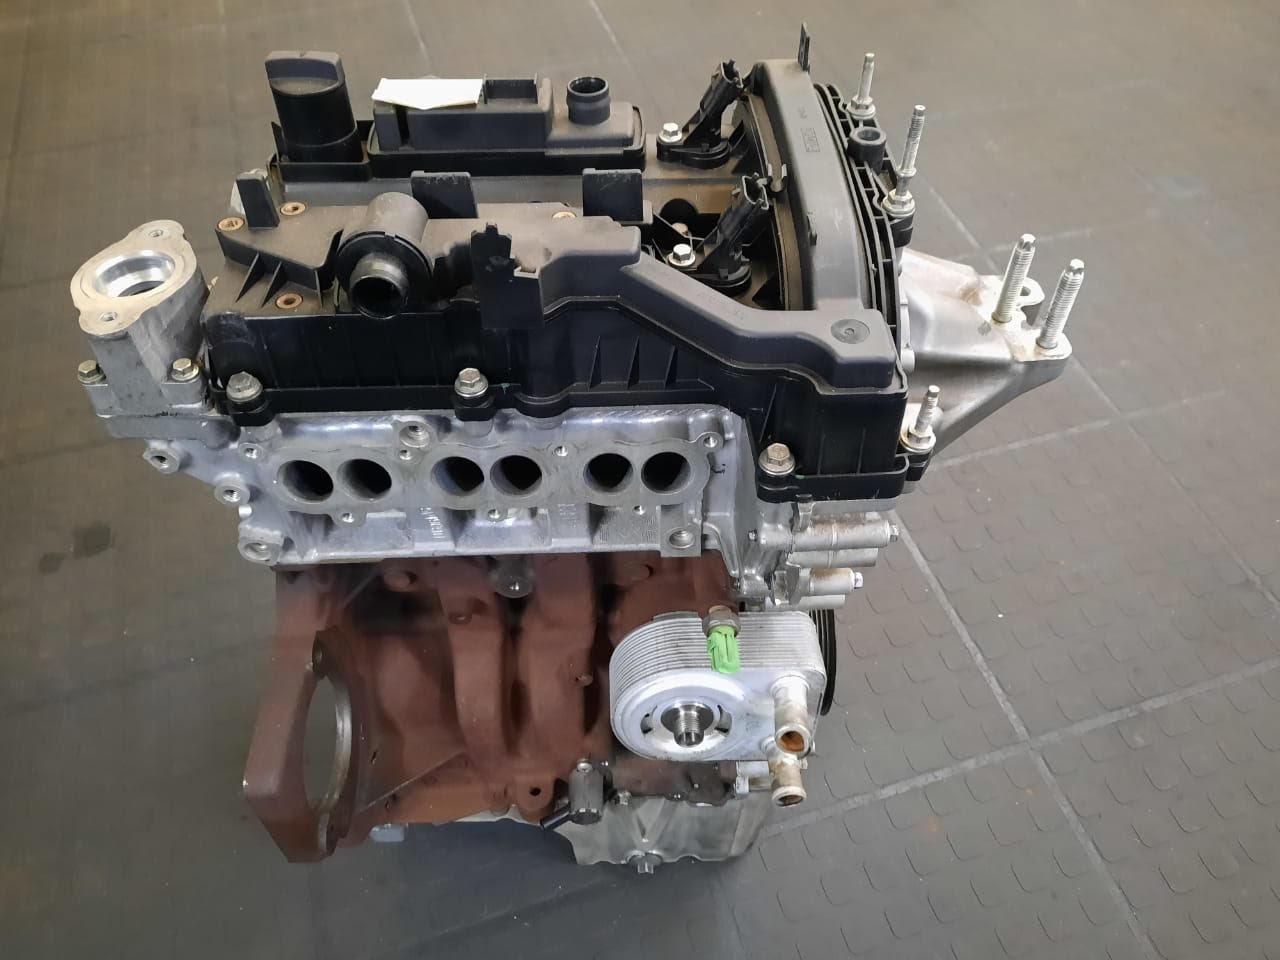 Ford Ecoboost 1.0 Engine